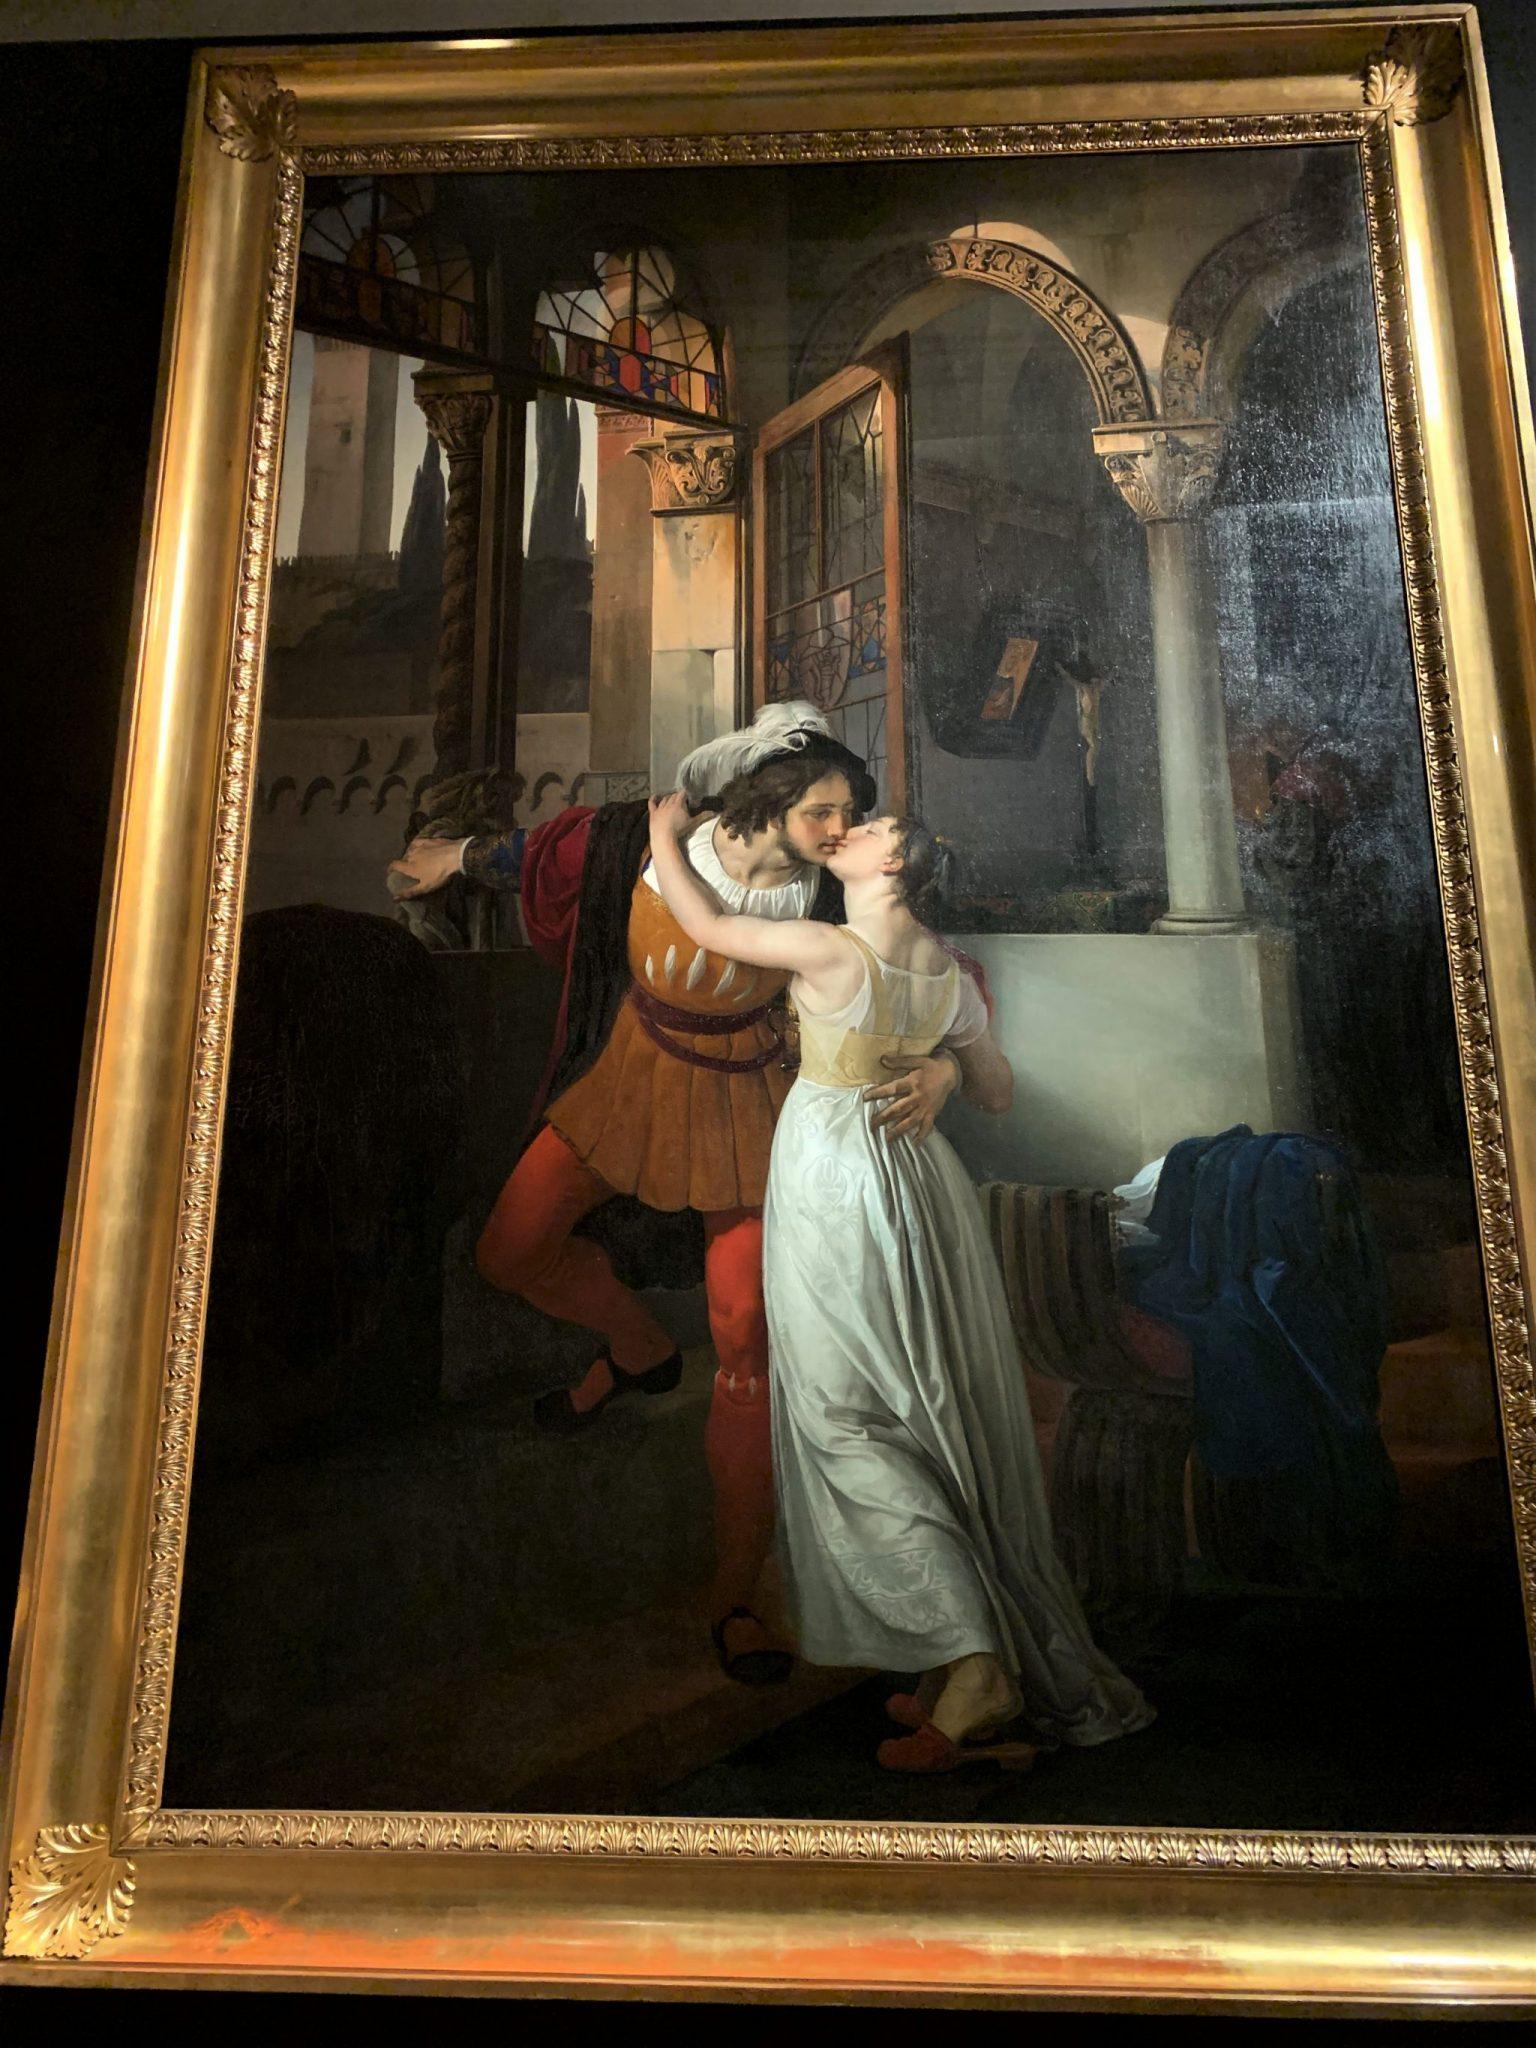 Art of Romanticism